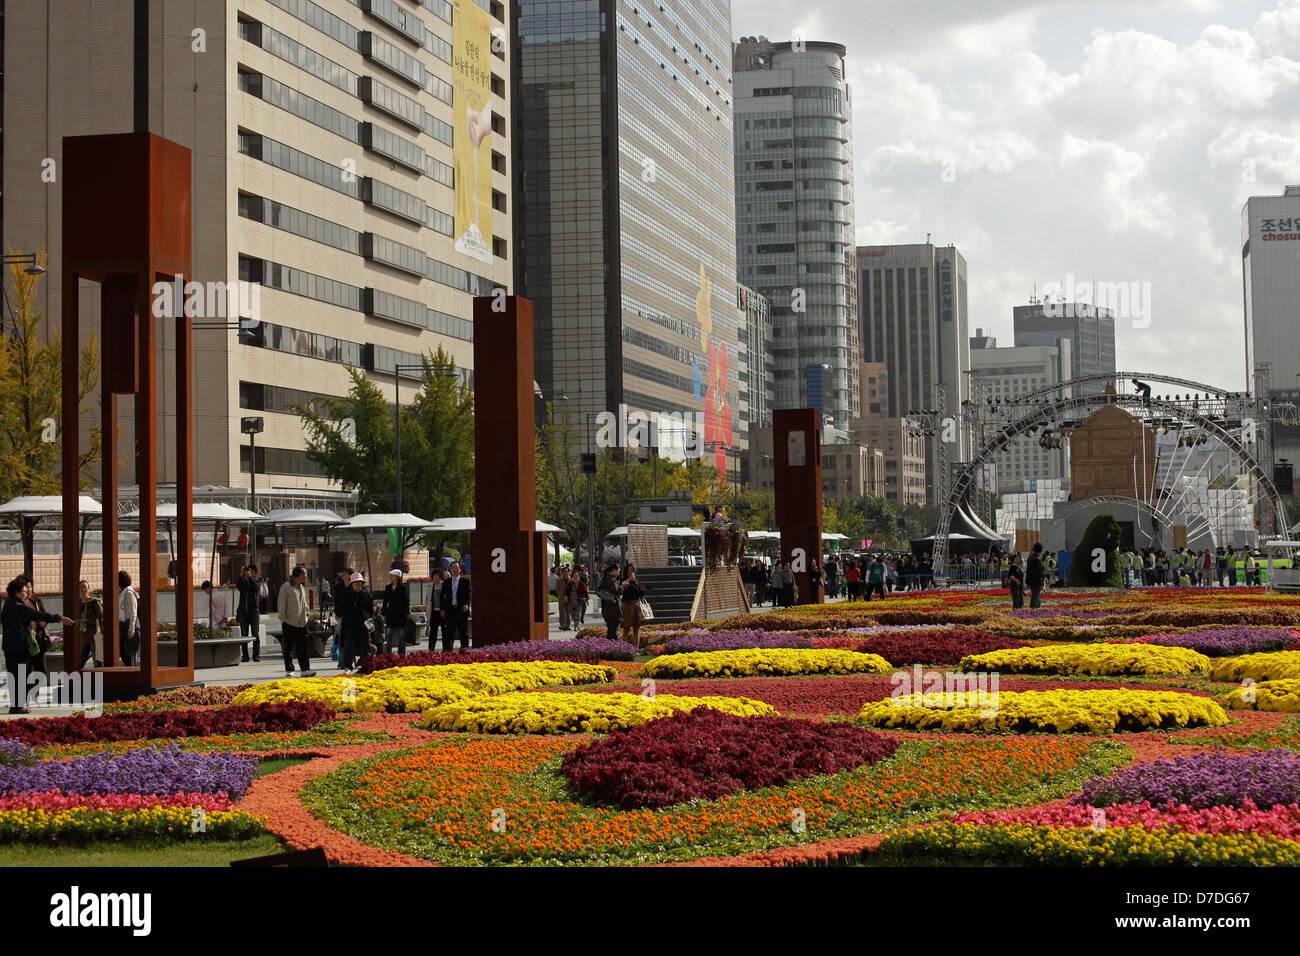 flower carpet on Sejongno street / Jongno-gu in downtown Seoul, South Korea, Asia Stock Photo